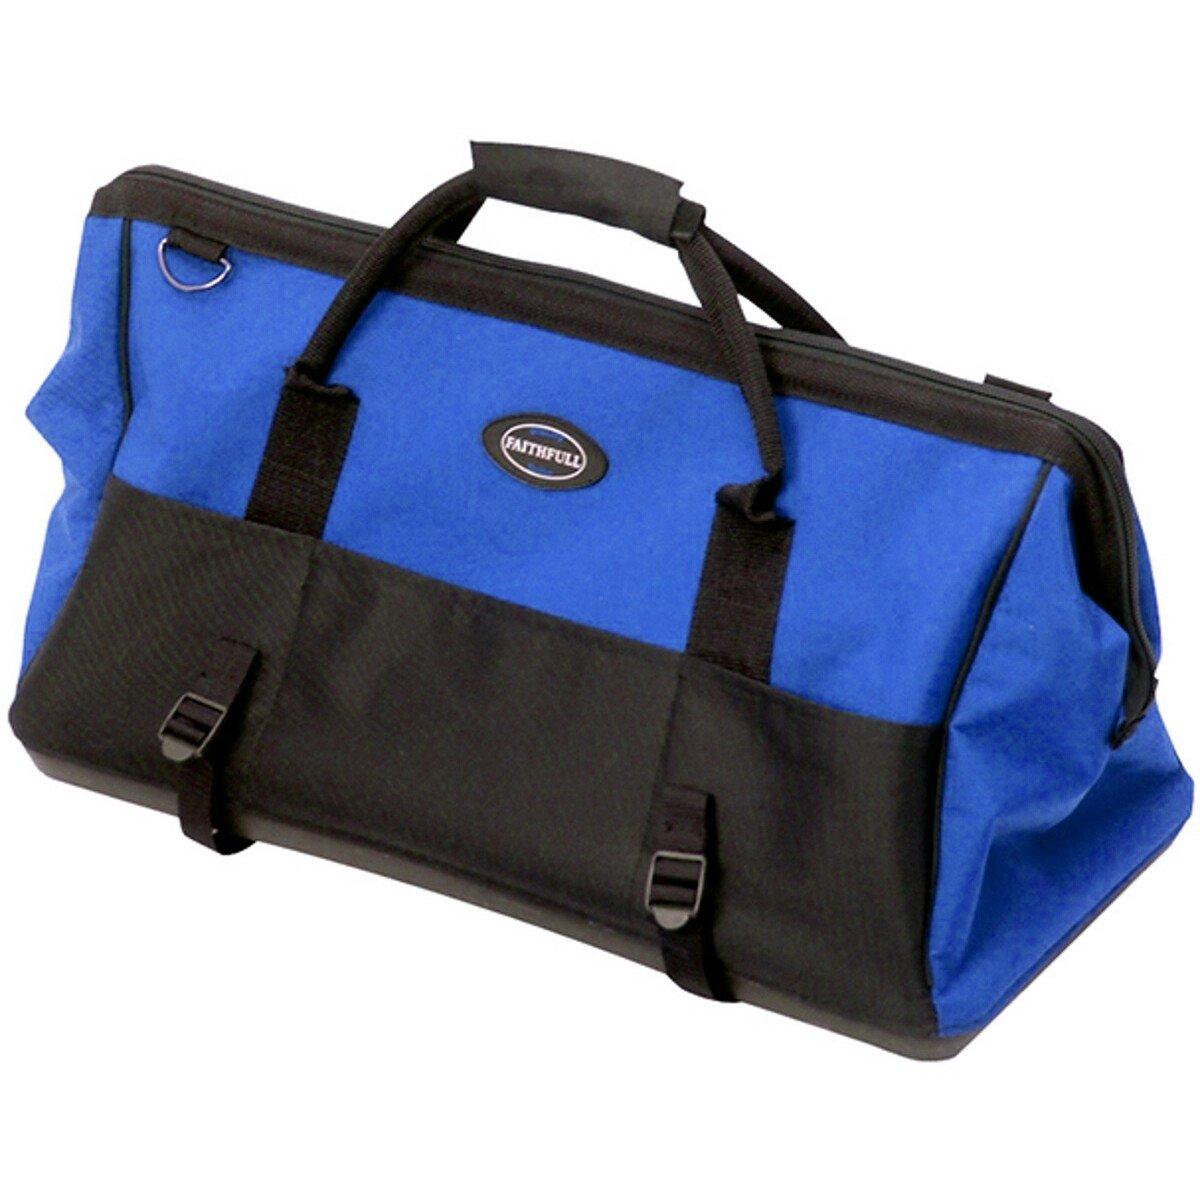 Faithfull FAITBHB16 Hard Base Tool Bag 40cm (16in)